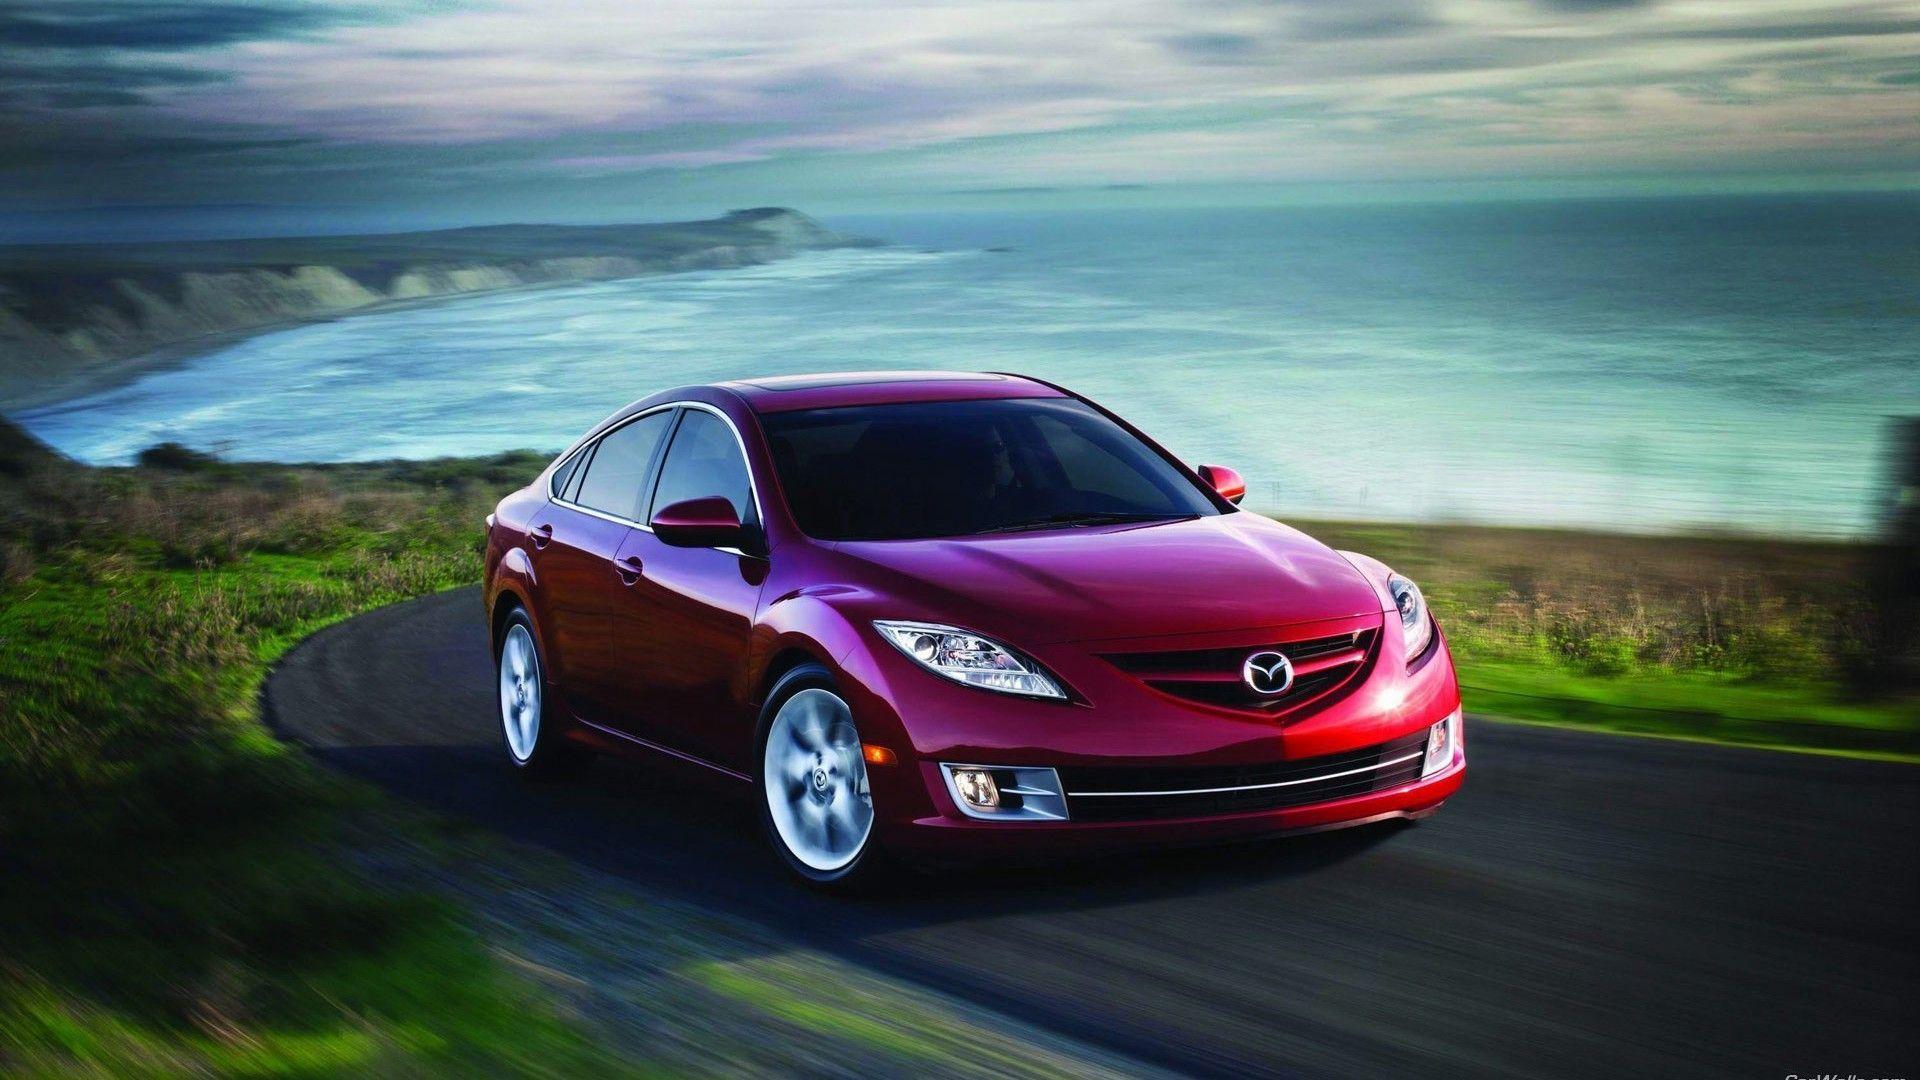 Mazda wallpaper photo